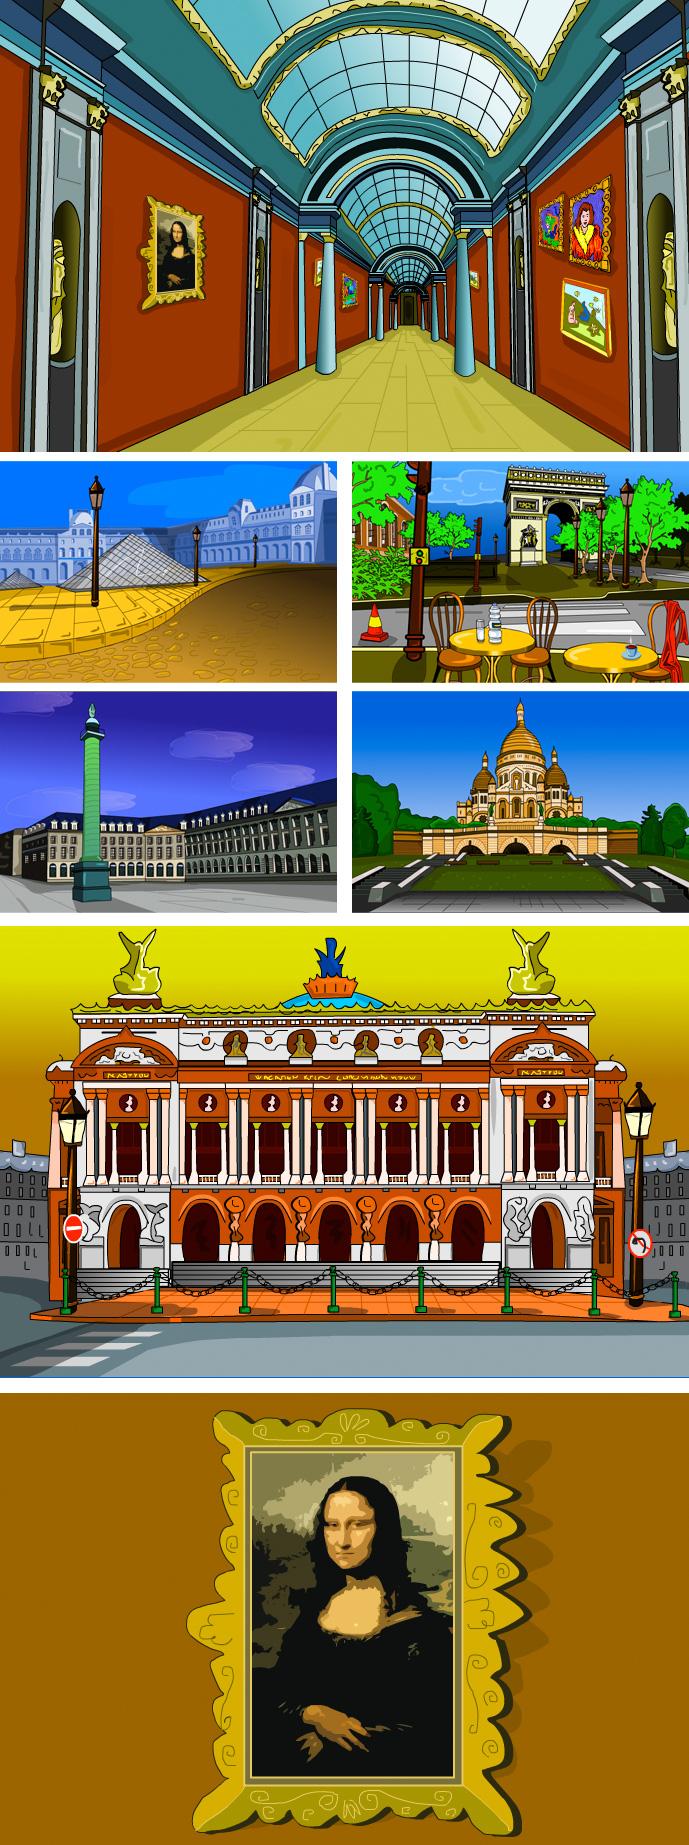 Flash Web Game / Paris